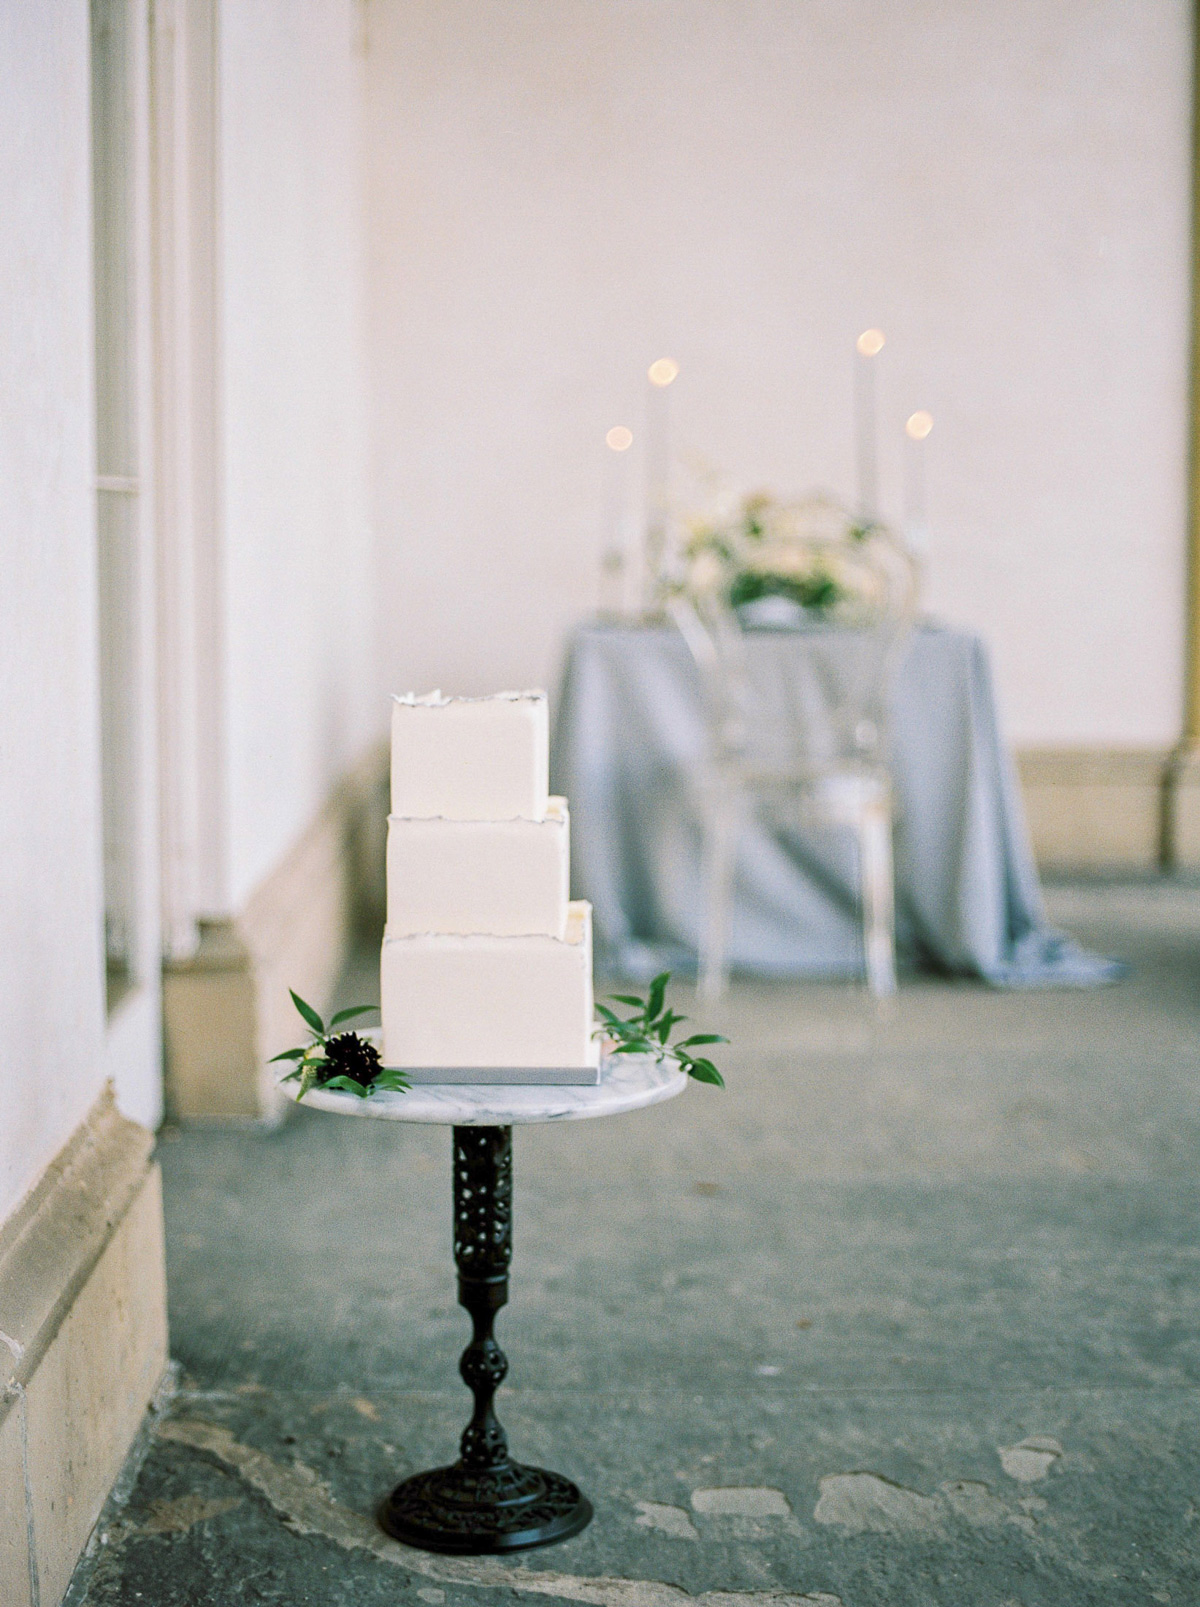 kurtz-orpia-photography-vineyard-bride-swish-list-dundurn-castle-dundas-wedding-editorial-9.jpg